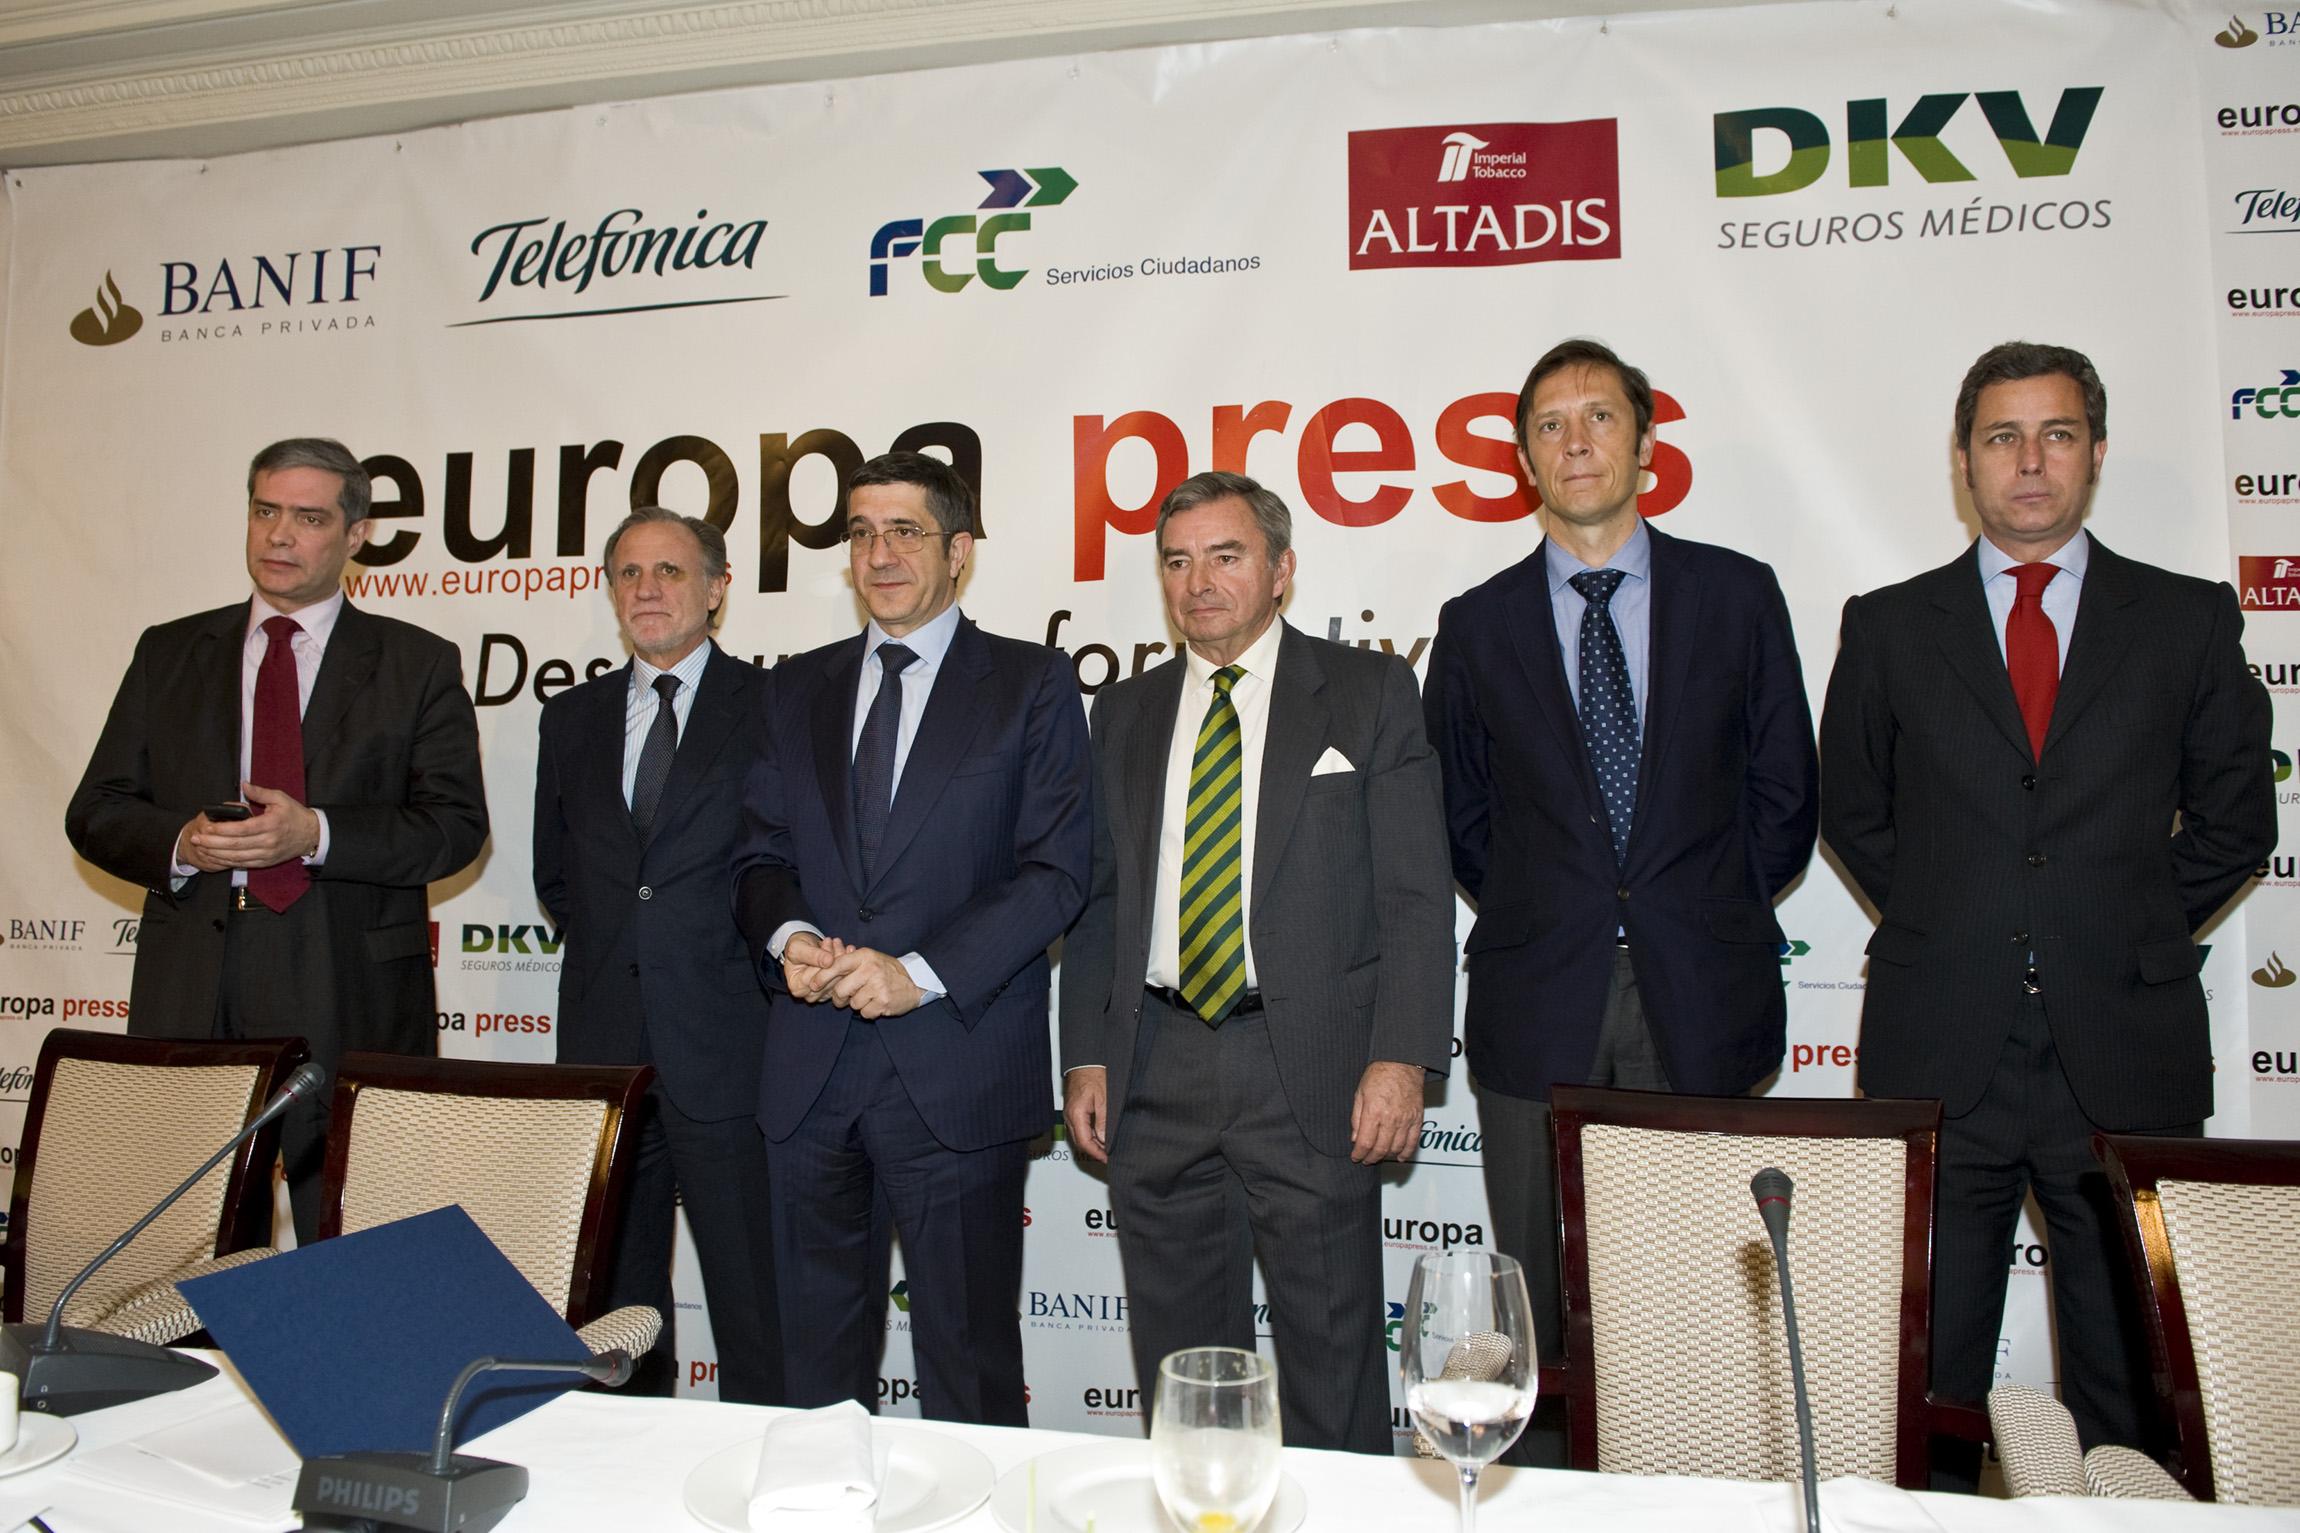 2012_03_26_lehen_europapress_158.jpg